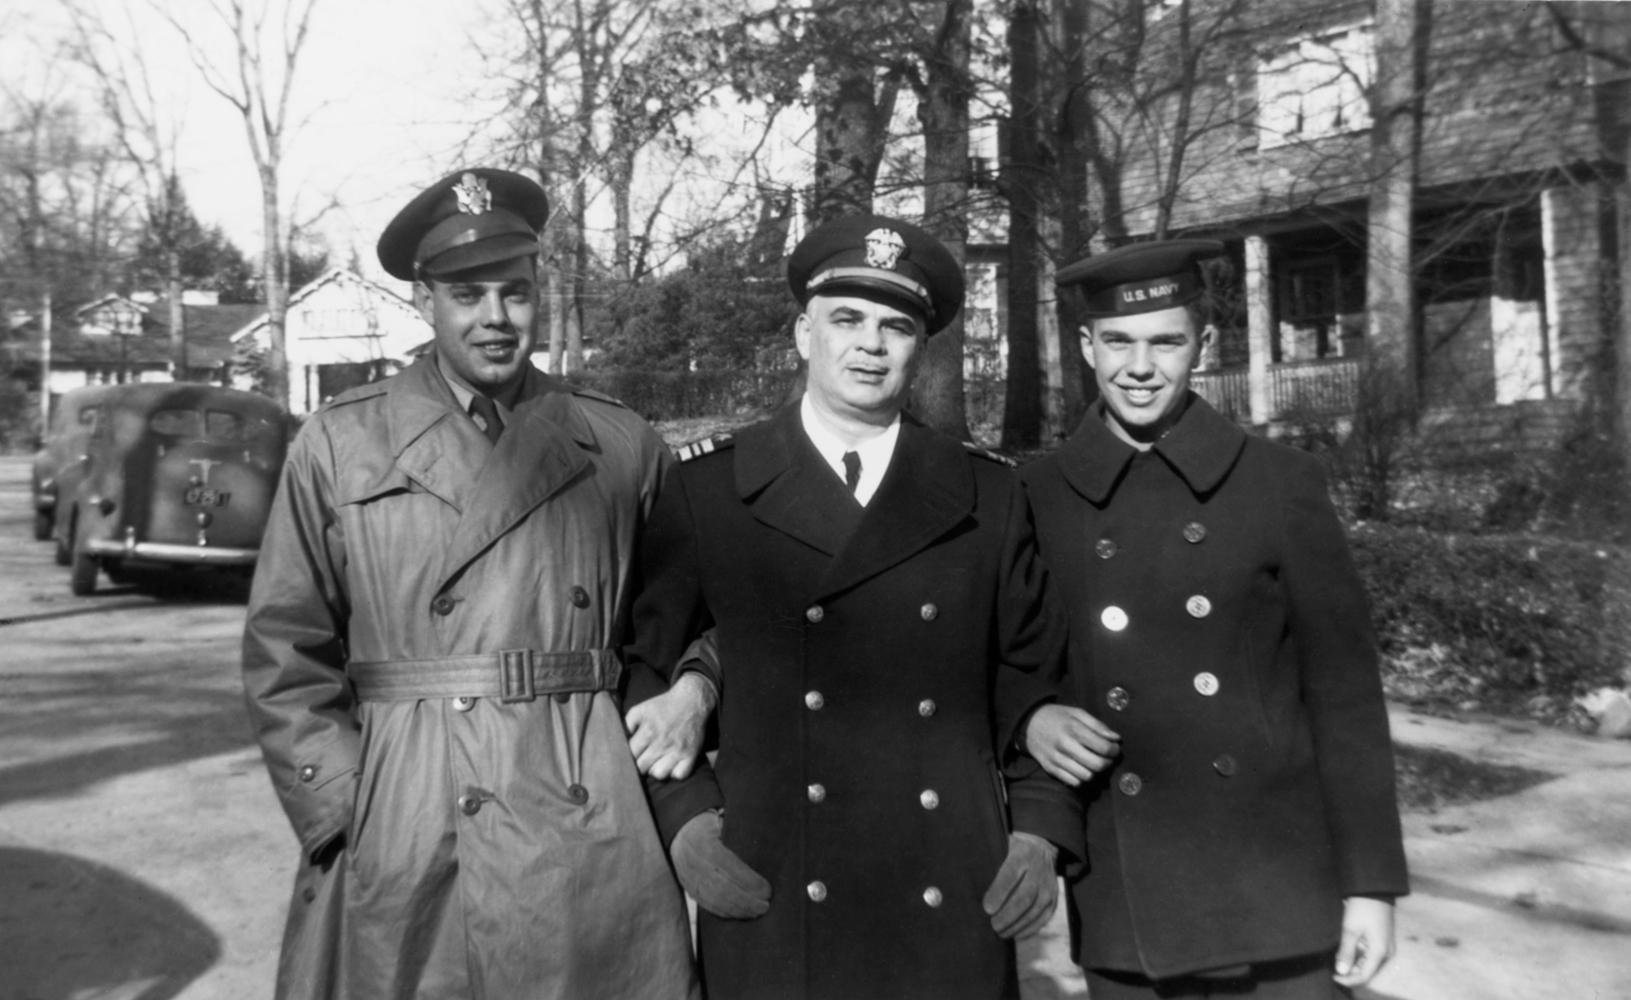 Doug, Harry and Buddy, 1944